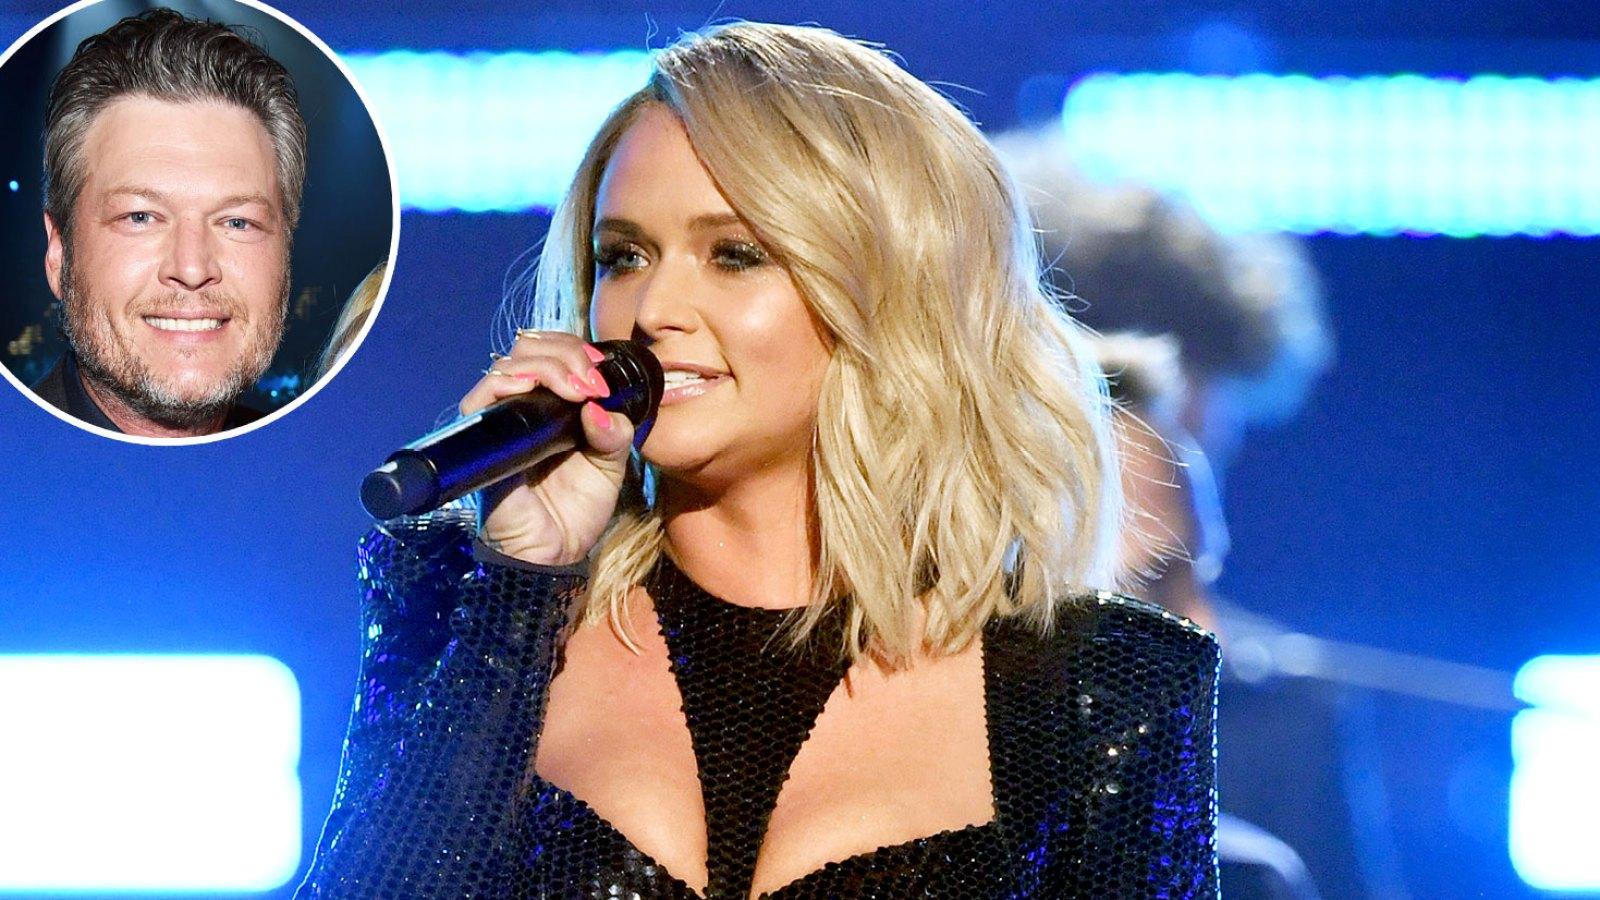 1530d52fa Miranda Lambert Performs at ACM Awards After Making Red Carpet Debut With  Husband Brendan McLoughlin